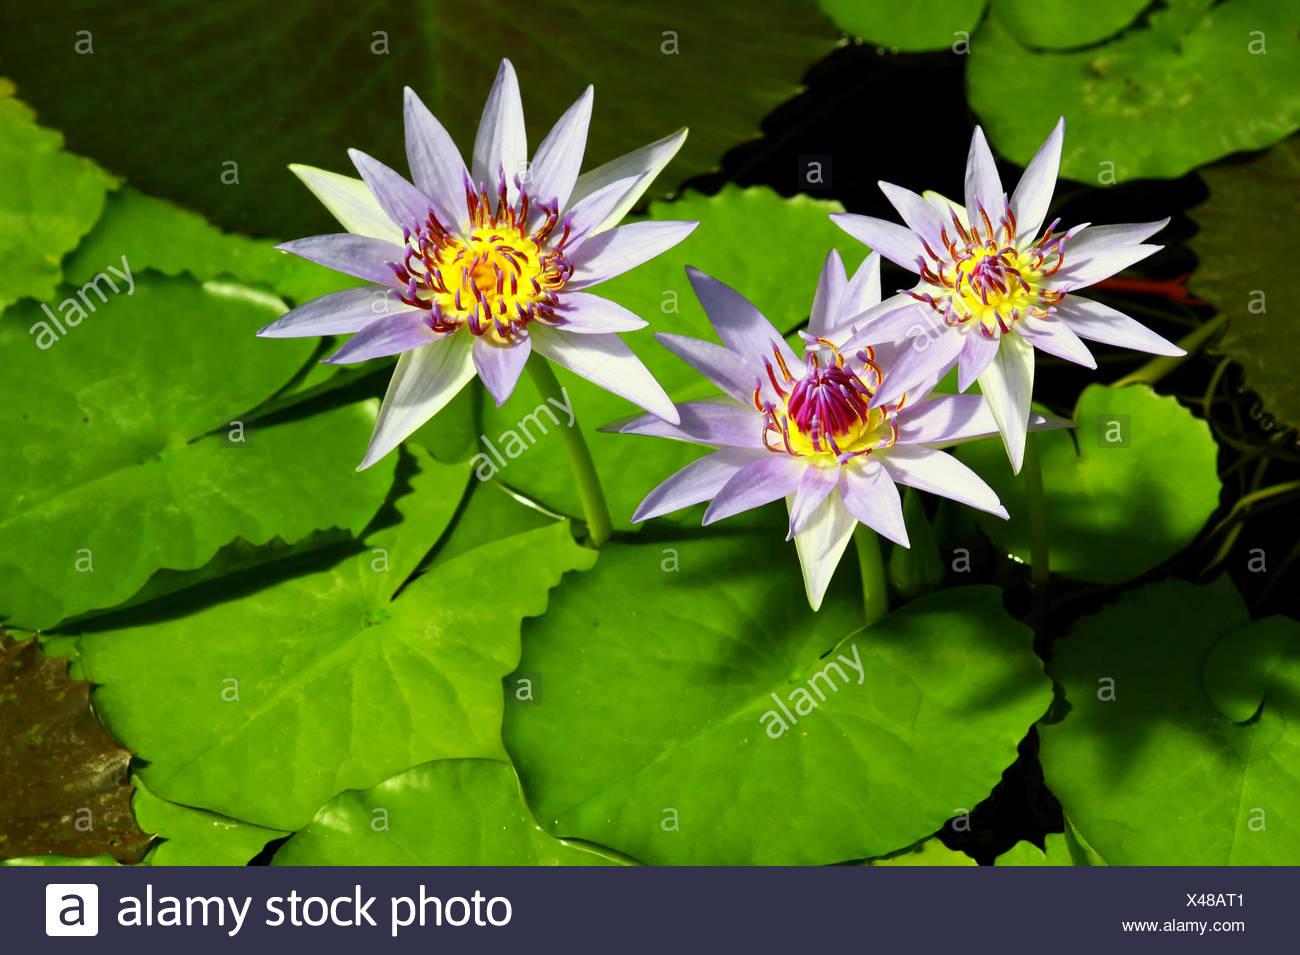 Three Water Lily Flowers Stock Photo 278008641 Alamy